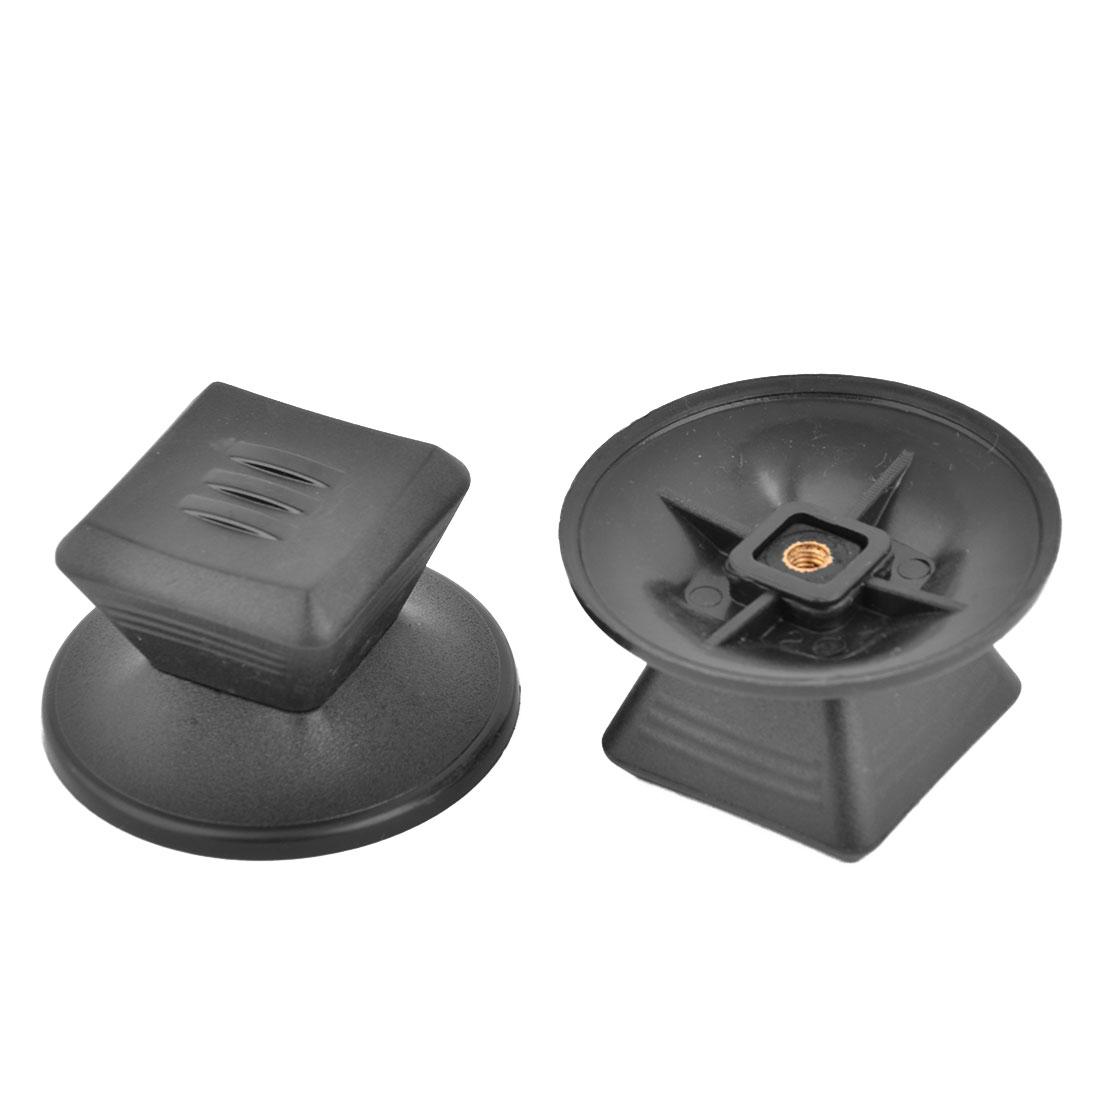 Household Plastic Frying Baking Pan Pot Kettle Lid Knob Handgrip Black 2pcs